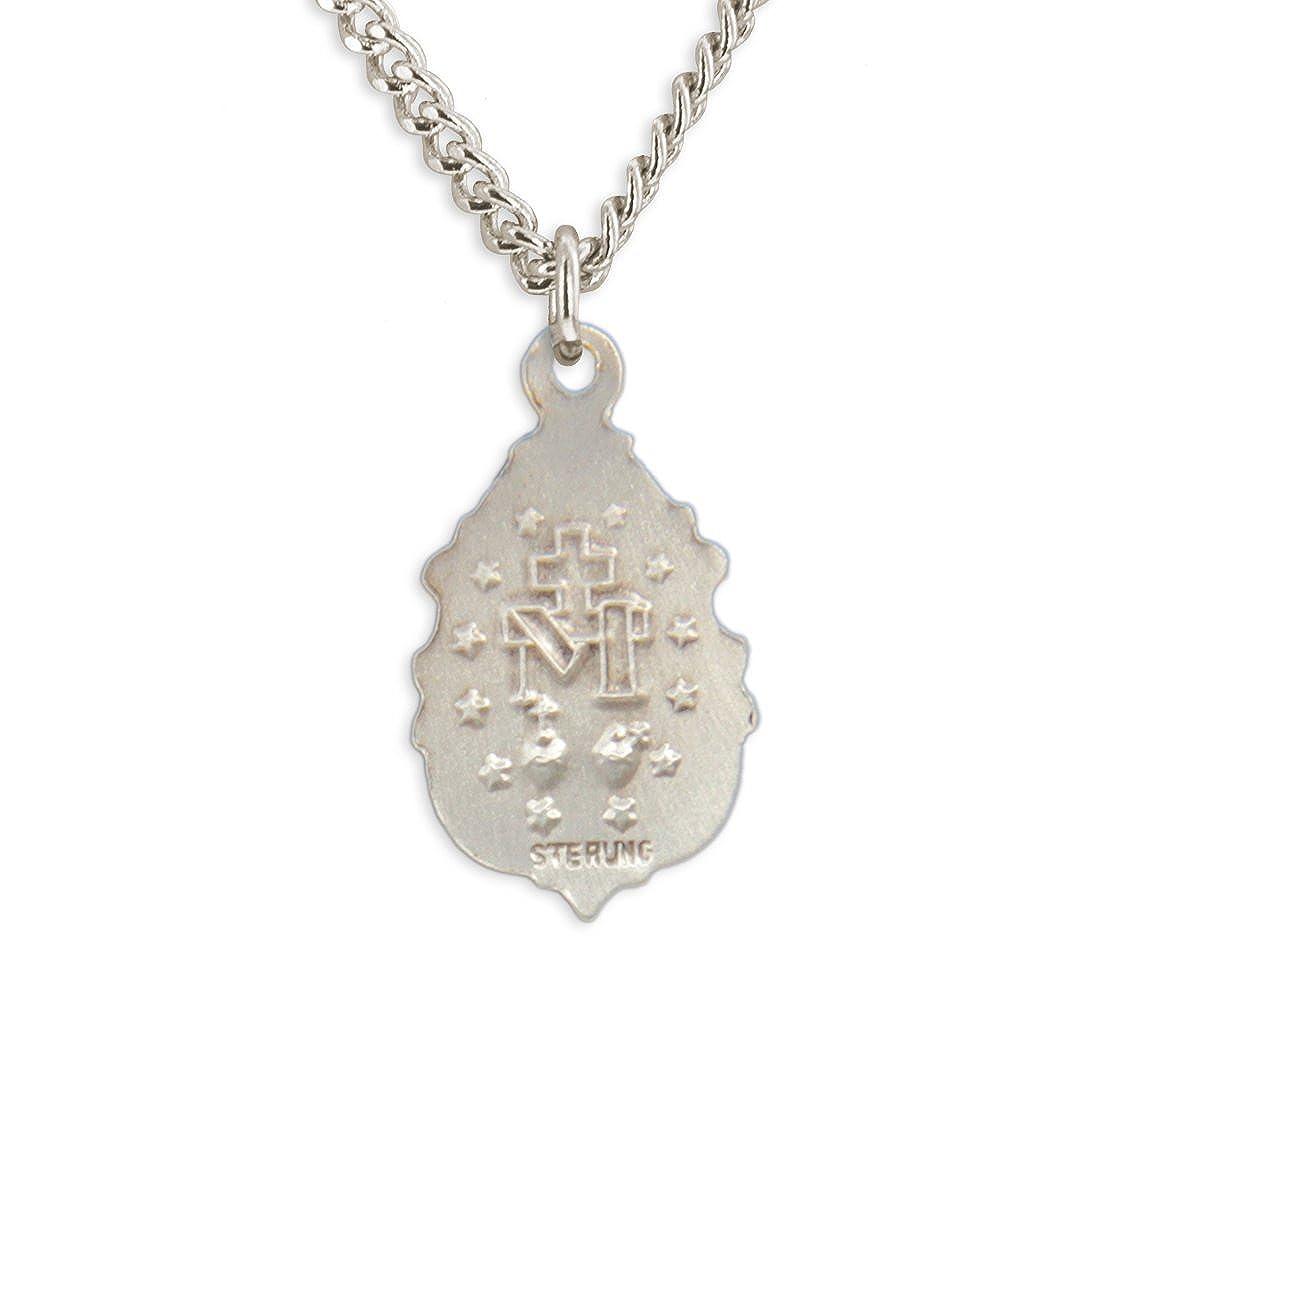 Heartland Store Womens Sterling Silver Fleur-de-lis Teardrop Miraculous Pendant Choose Chain USA Made